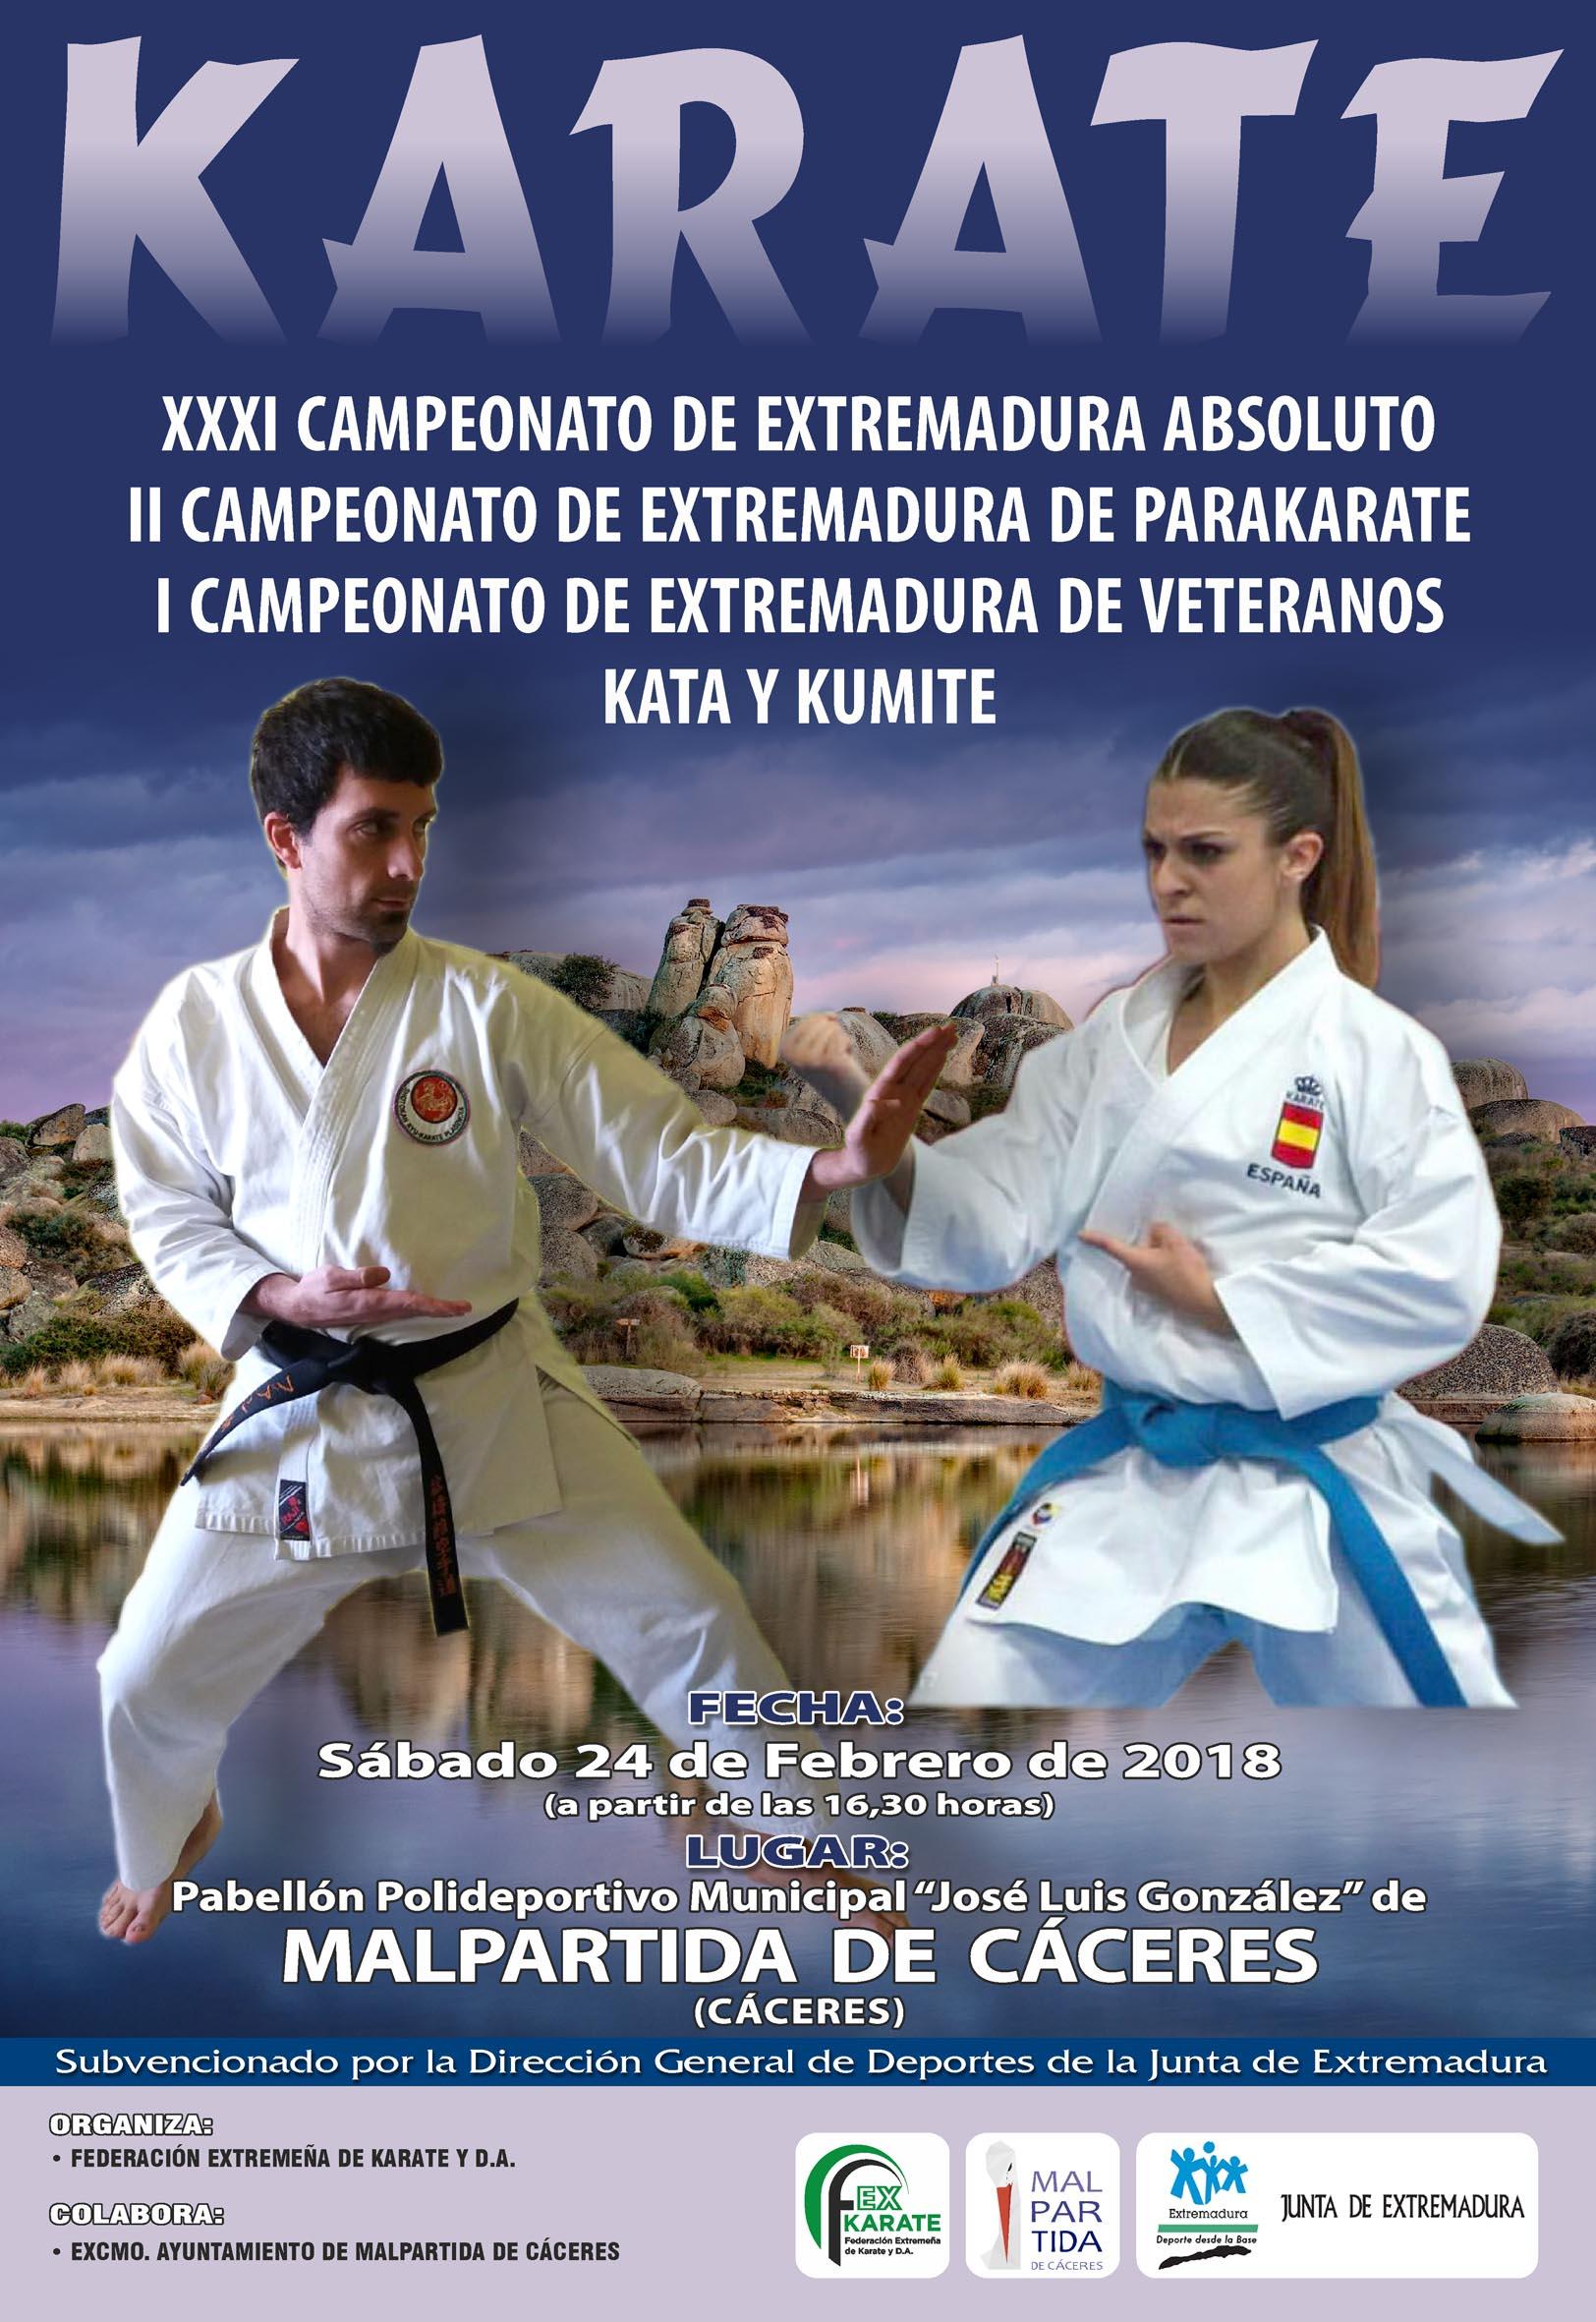 Campeonato de Extremadura Senior-ParaKarate 2018